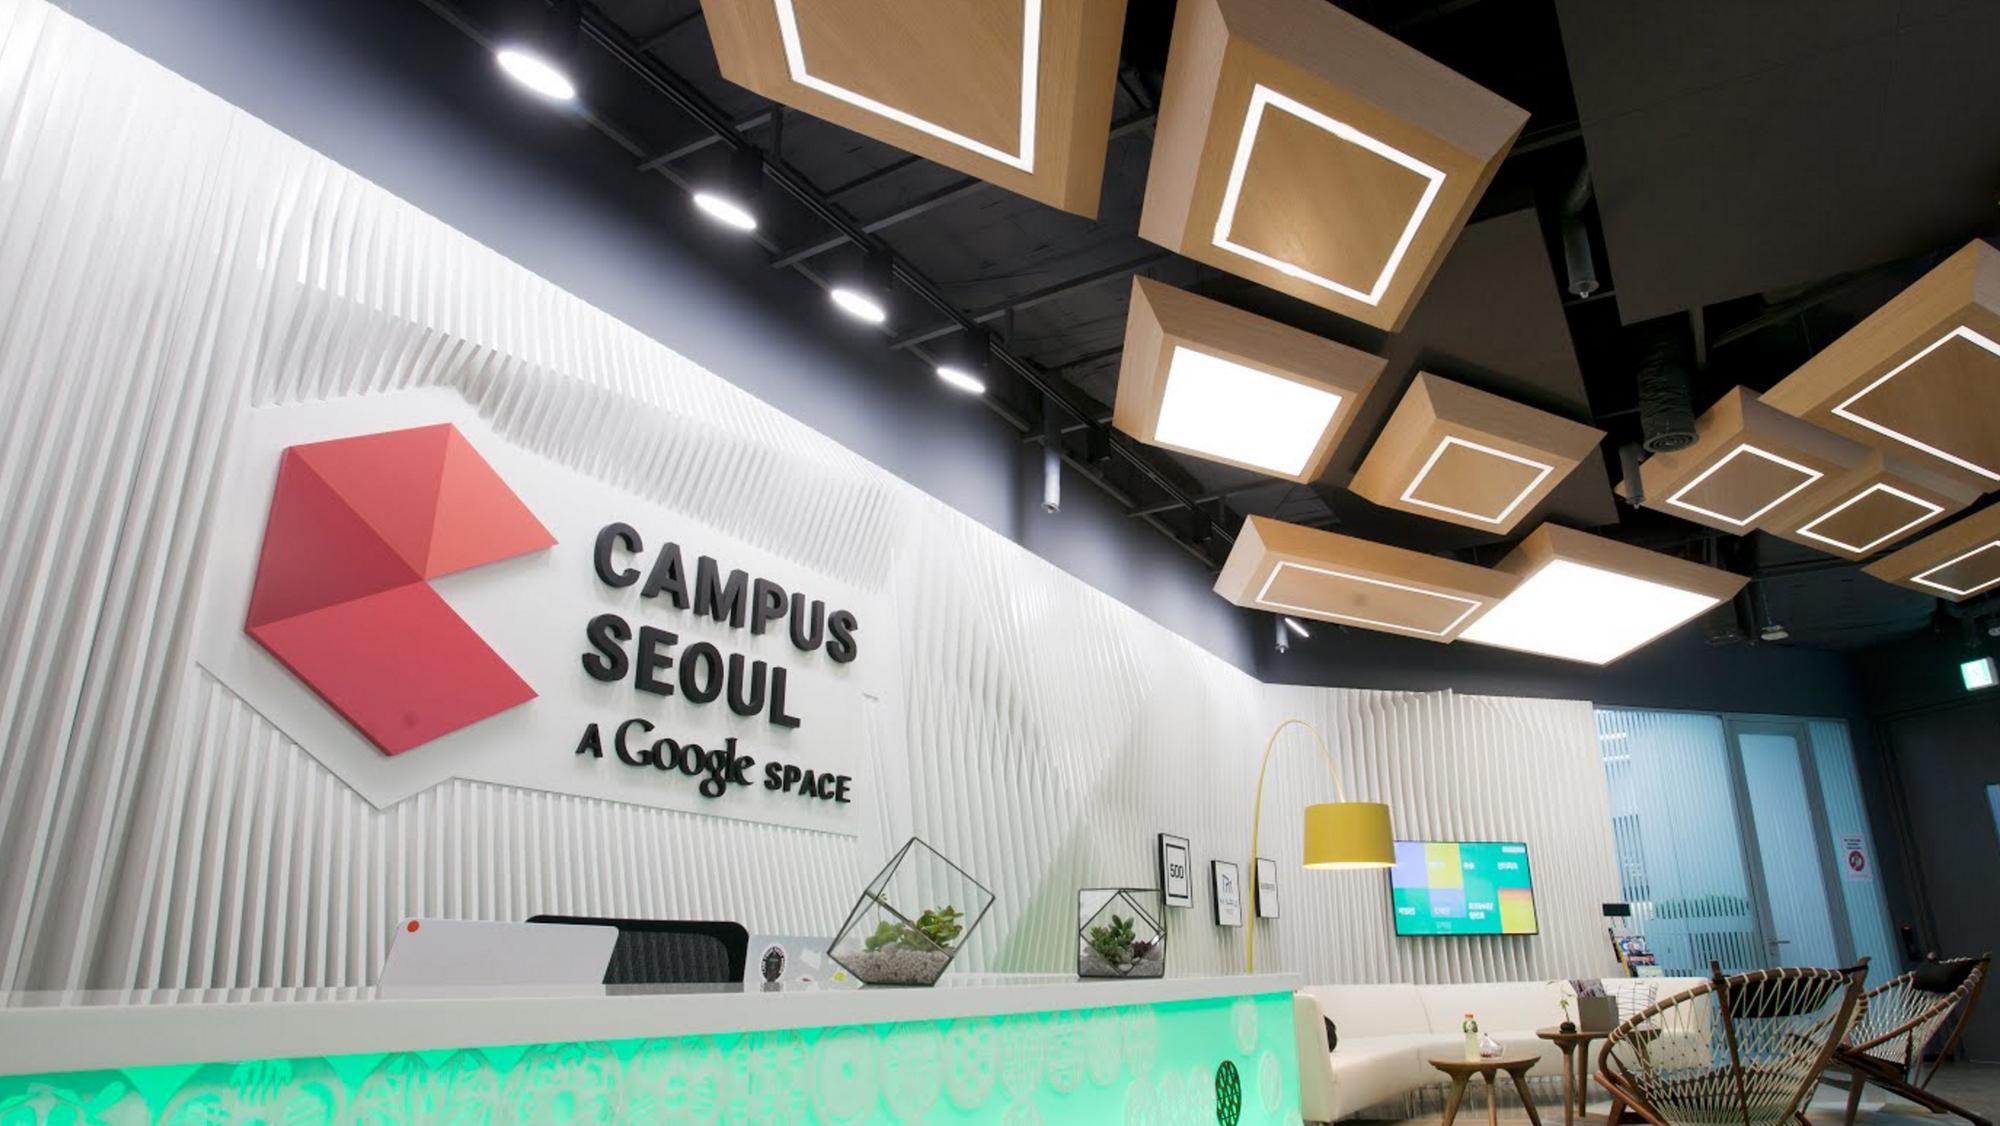 Campus_Seoul_2.png